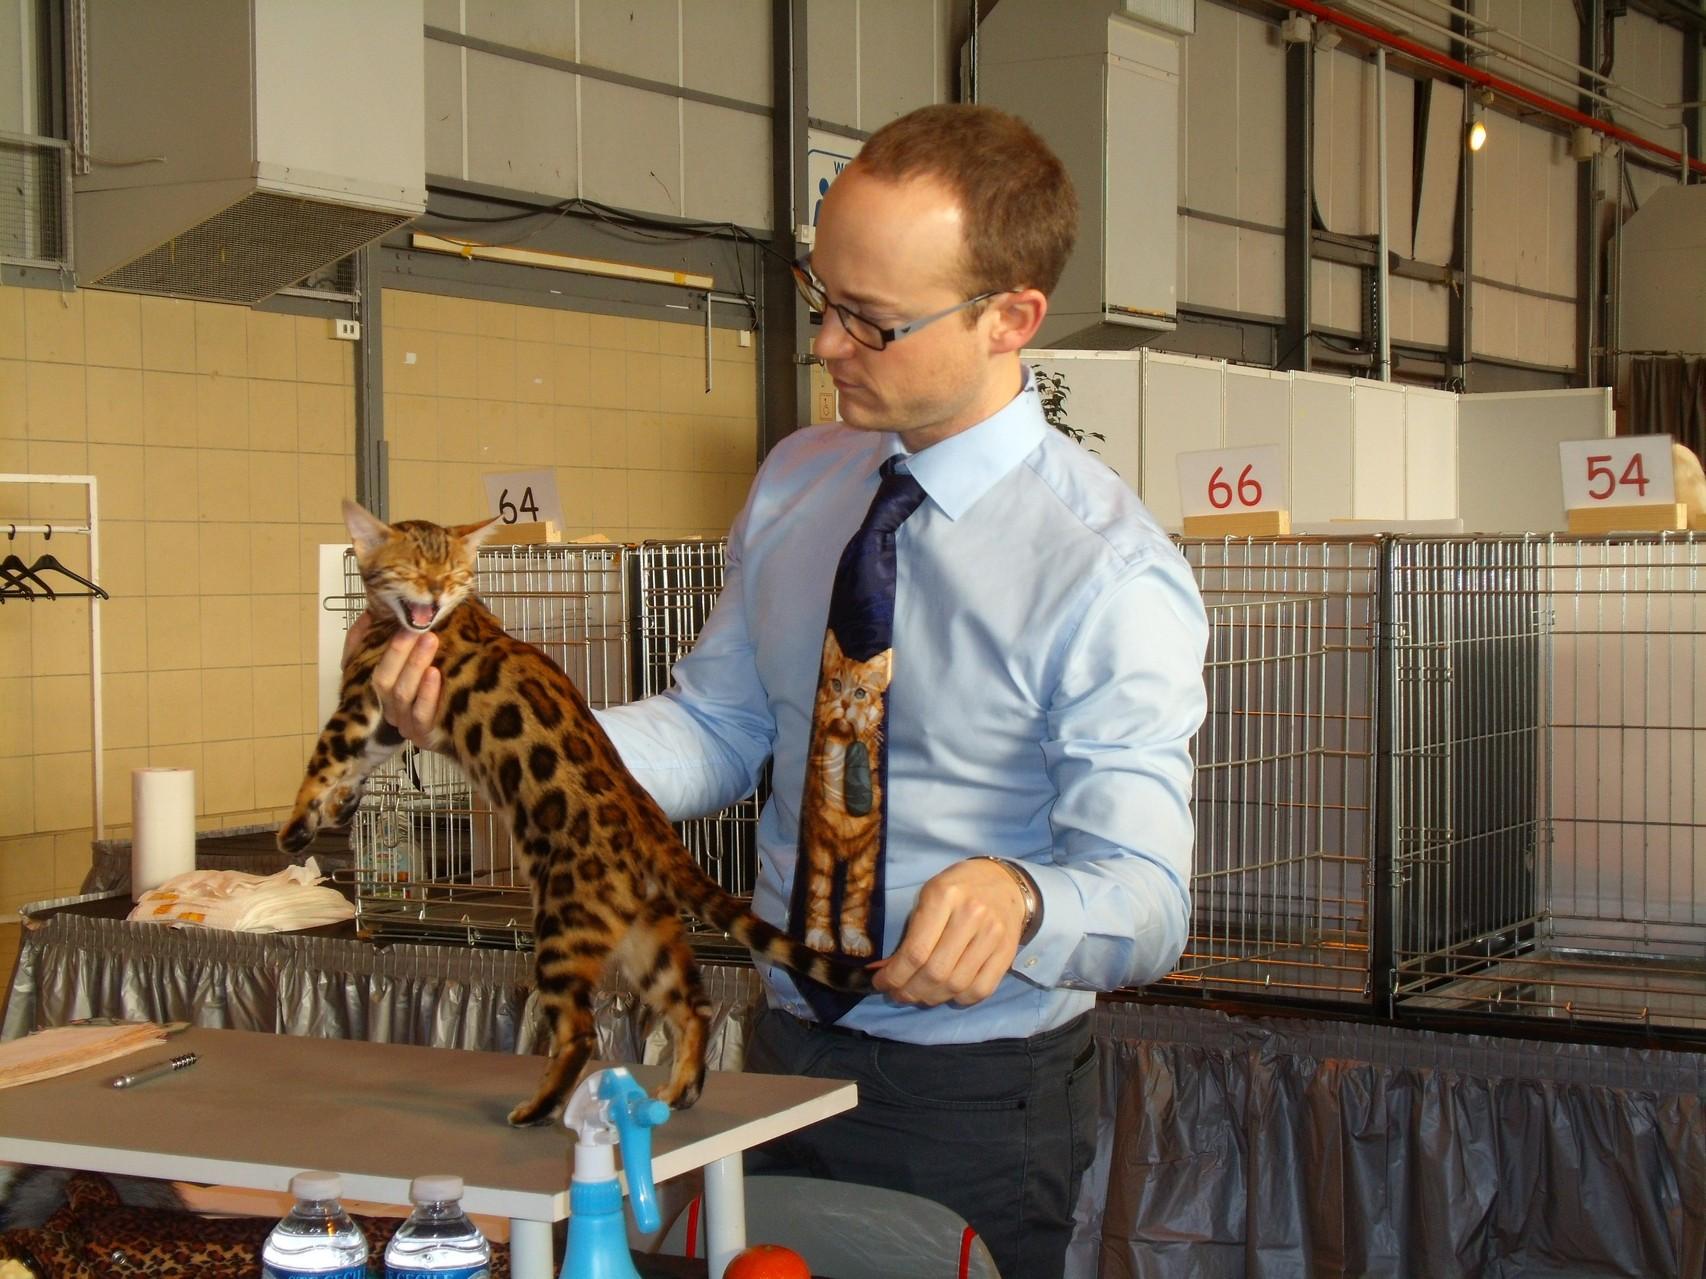 Exposicion felina Toulouse con Steven Corneille (juez SP) - 08-02-2014